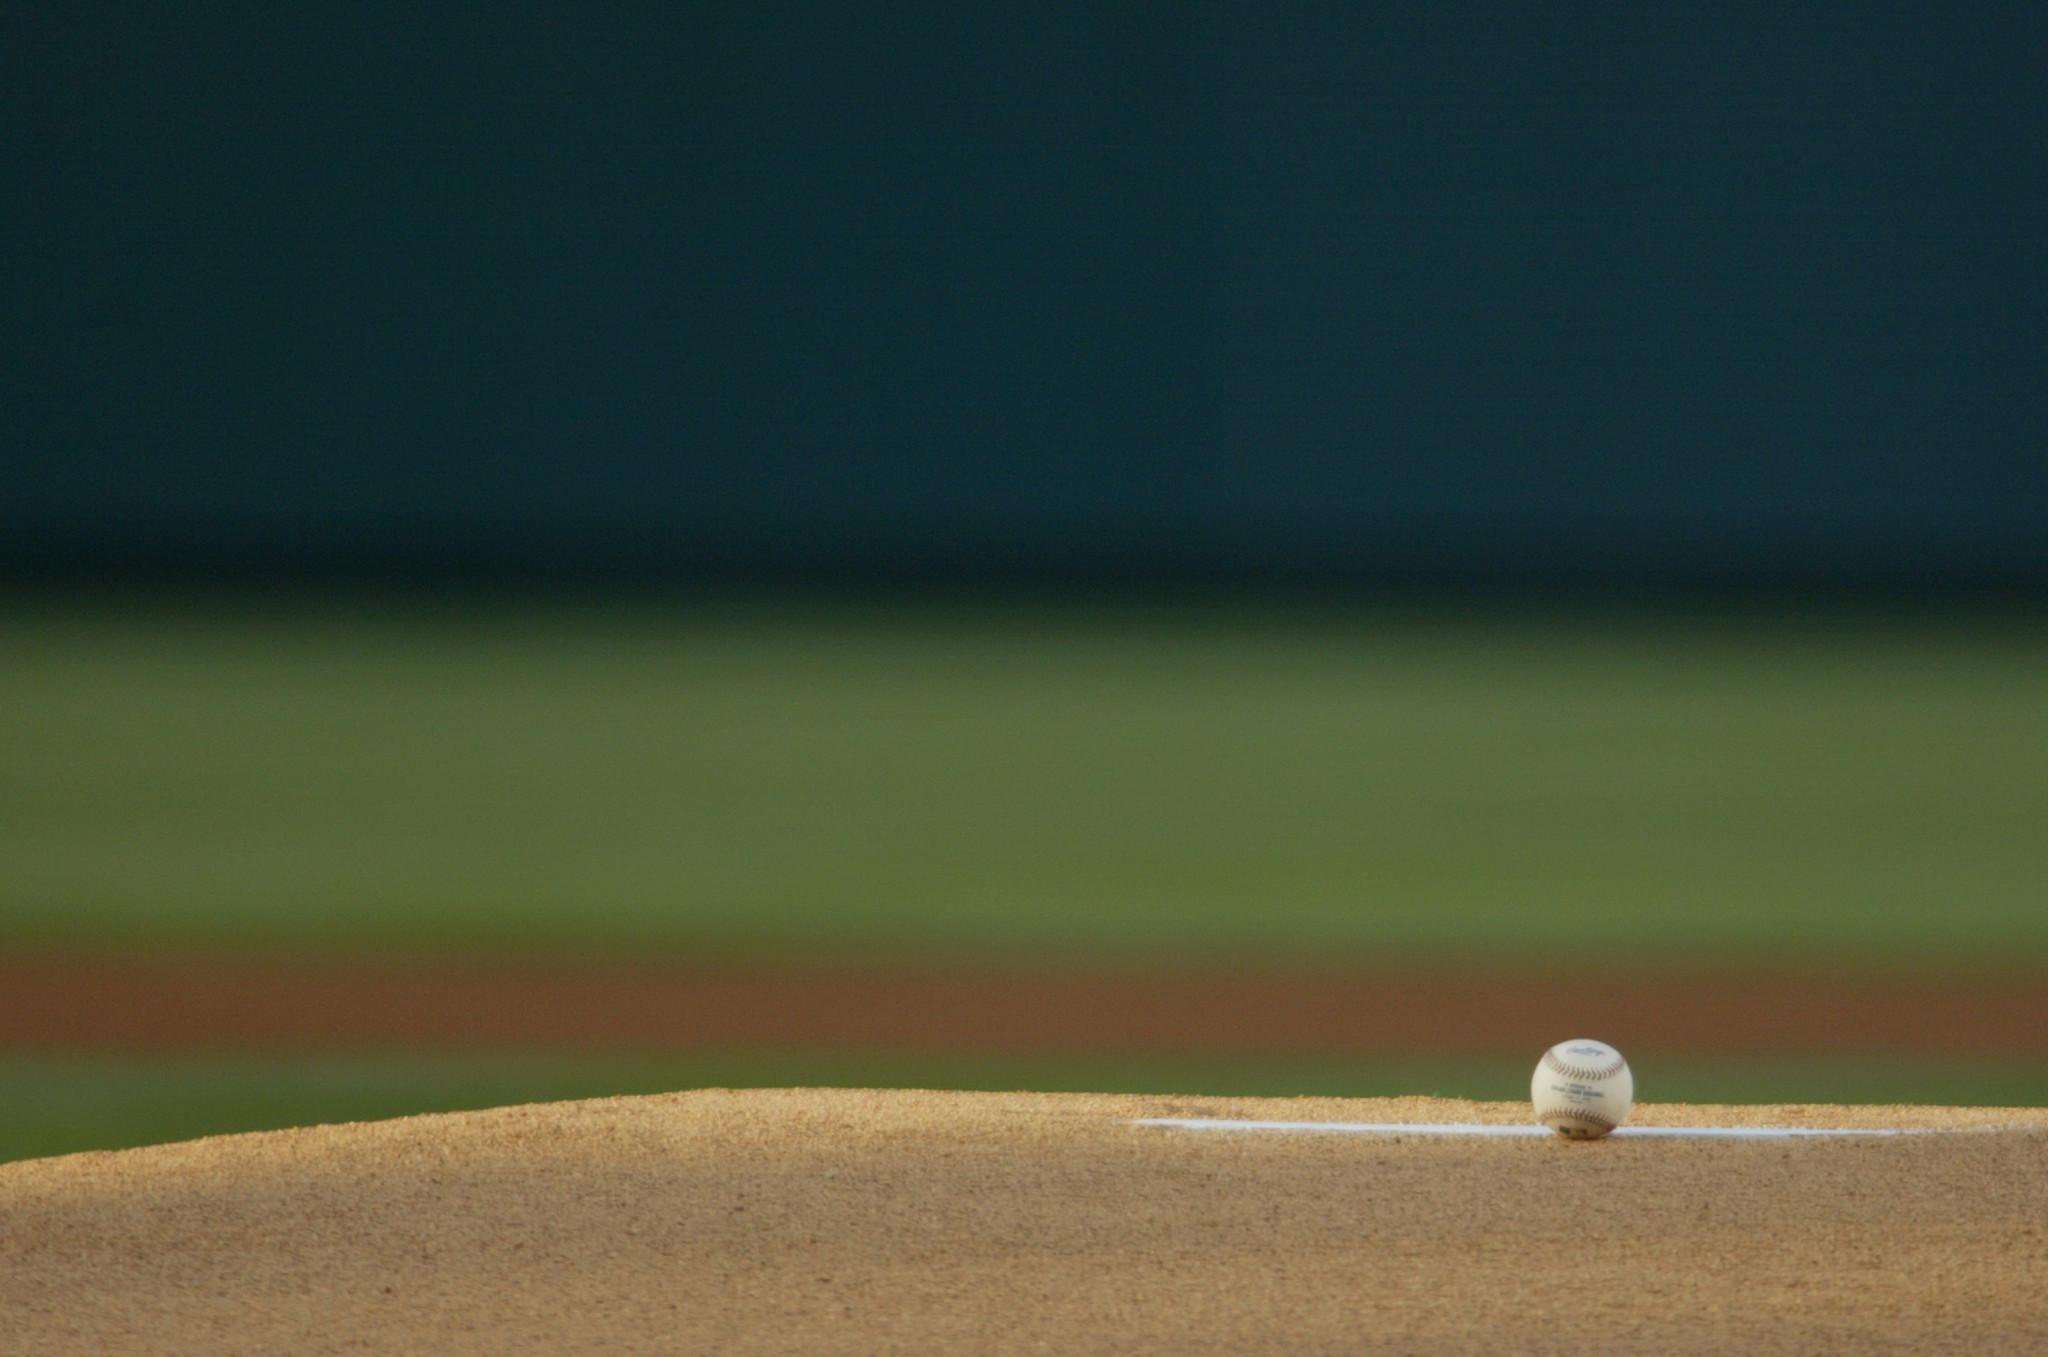 Hosts Curaçao upset Cuba to win Caribbean Baseball Cup